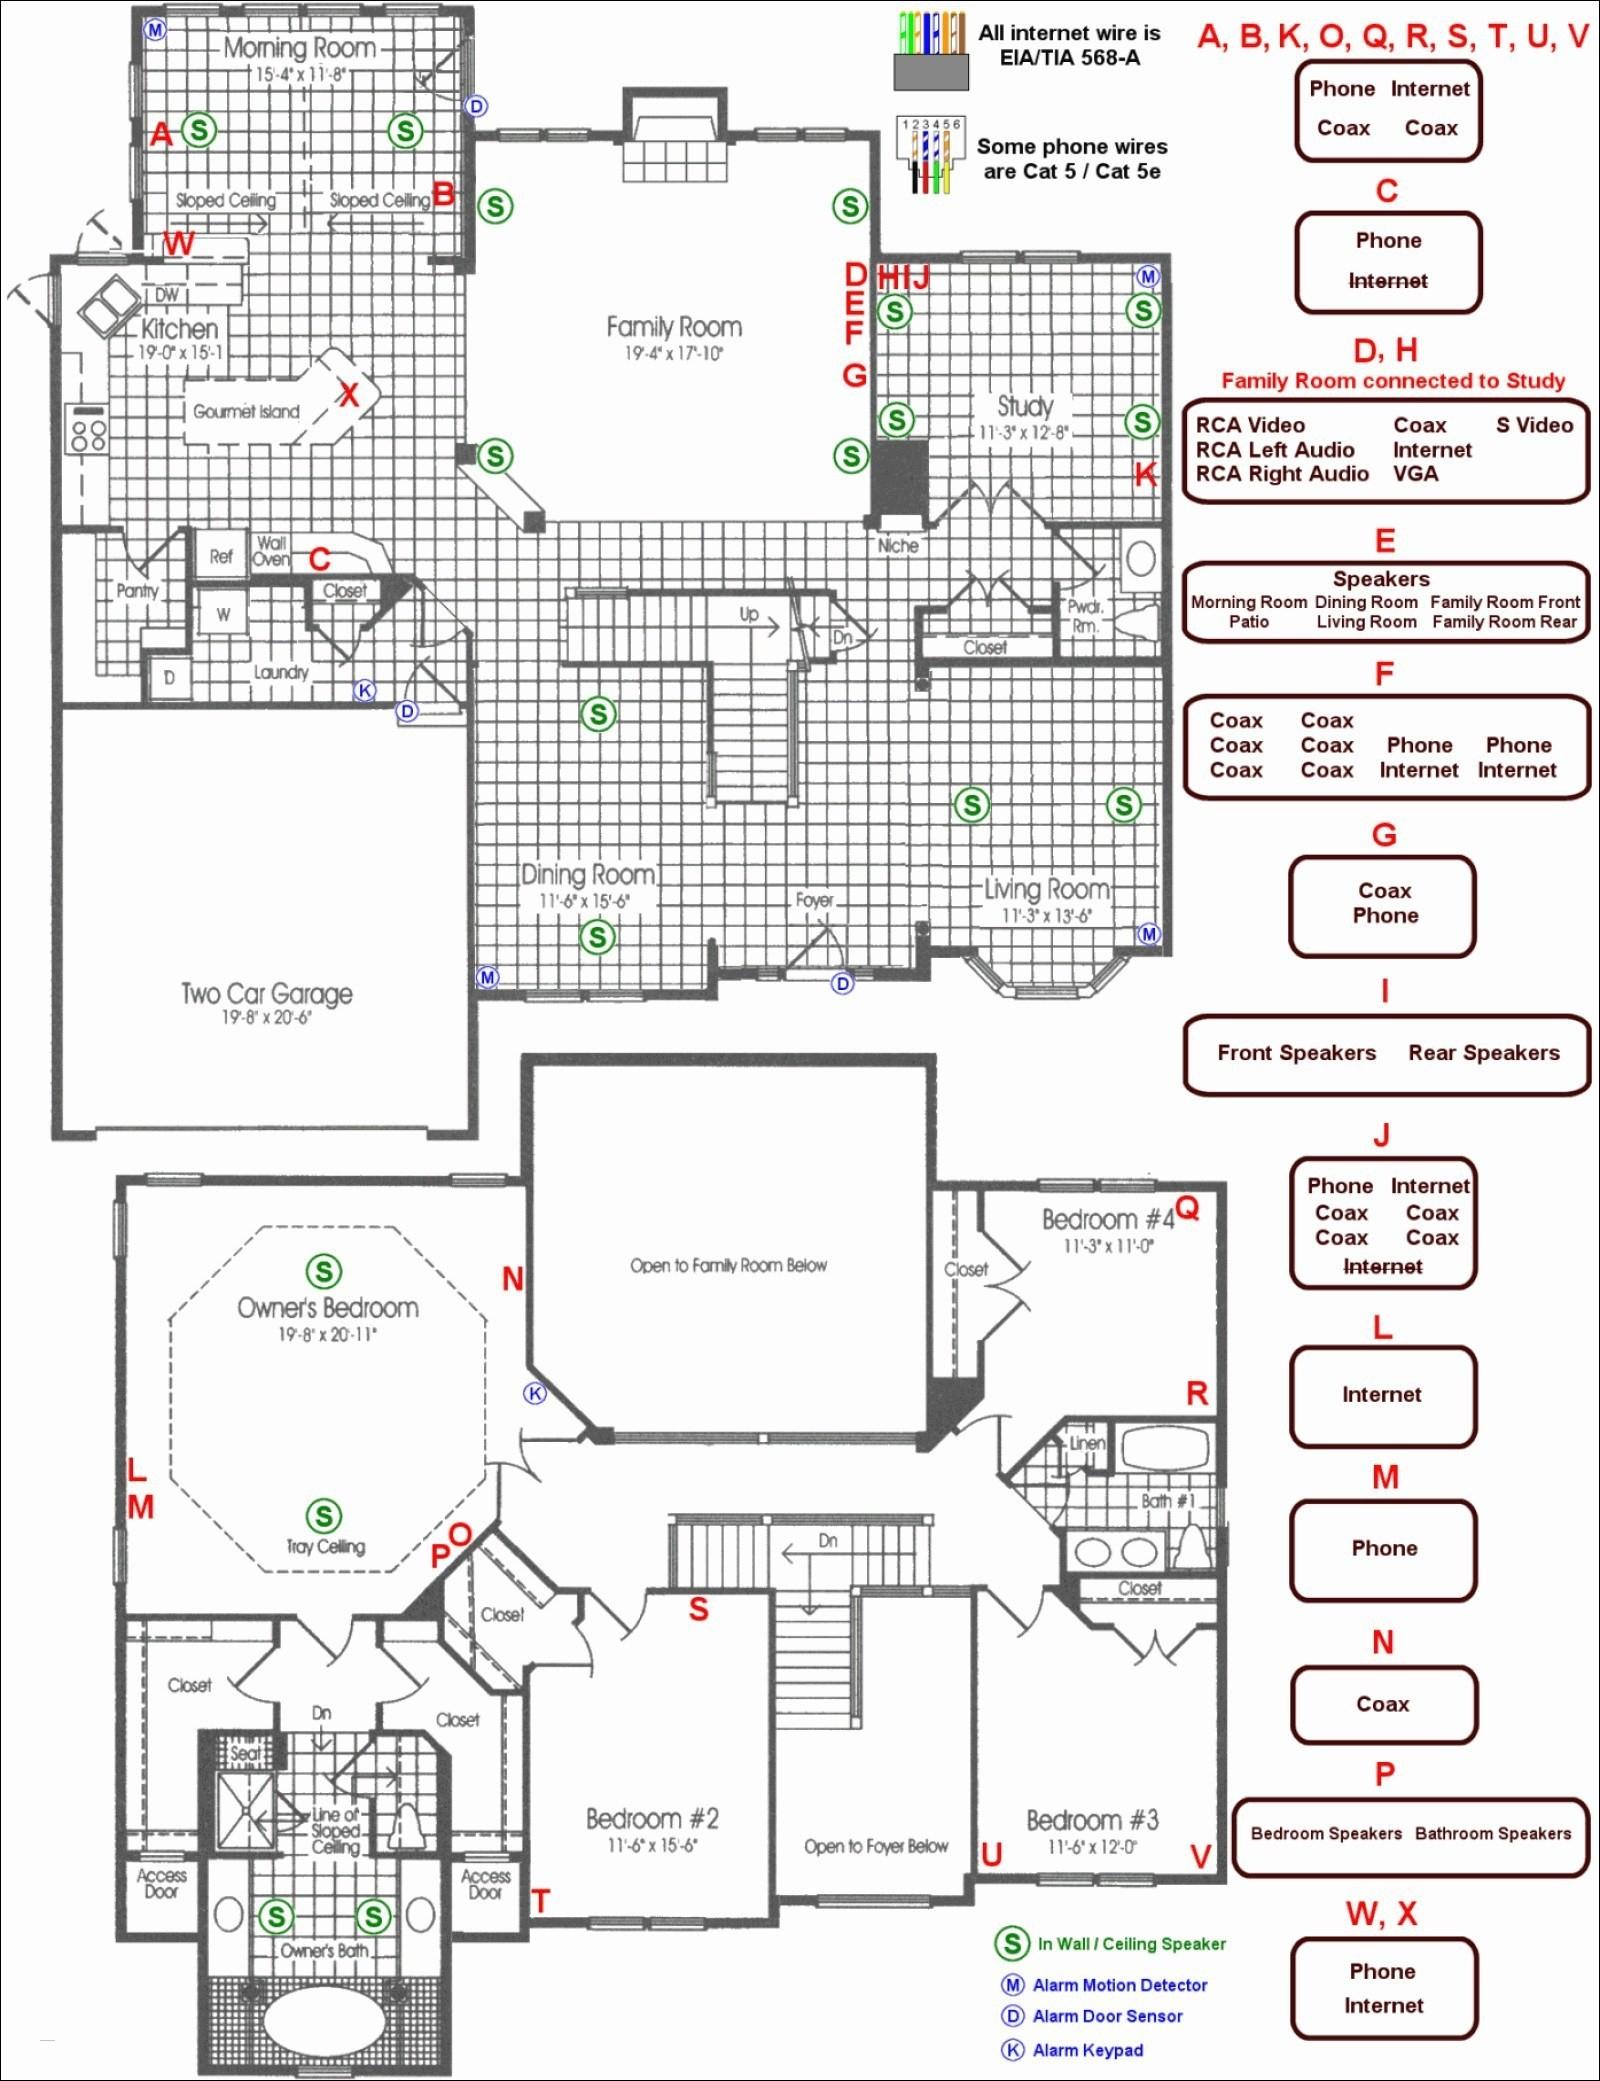 Building Wiring Diagram Symbols - Wiring Diagram Online - House Wiring Diagram Pdf